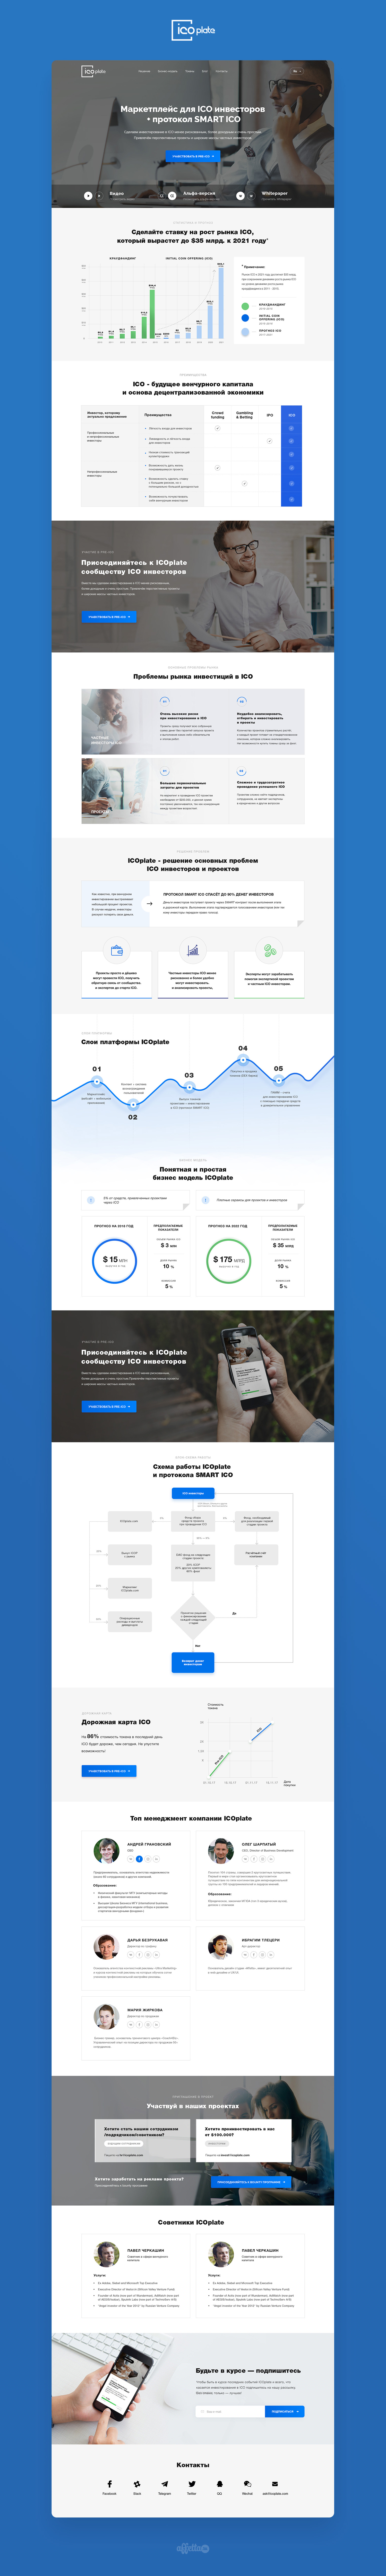 ICOplate - Маркетплейс для ICO инвесторов